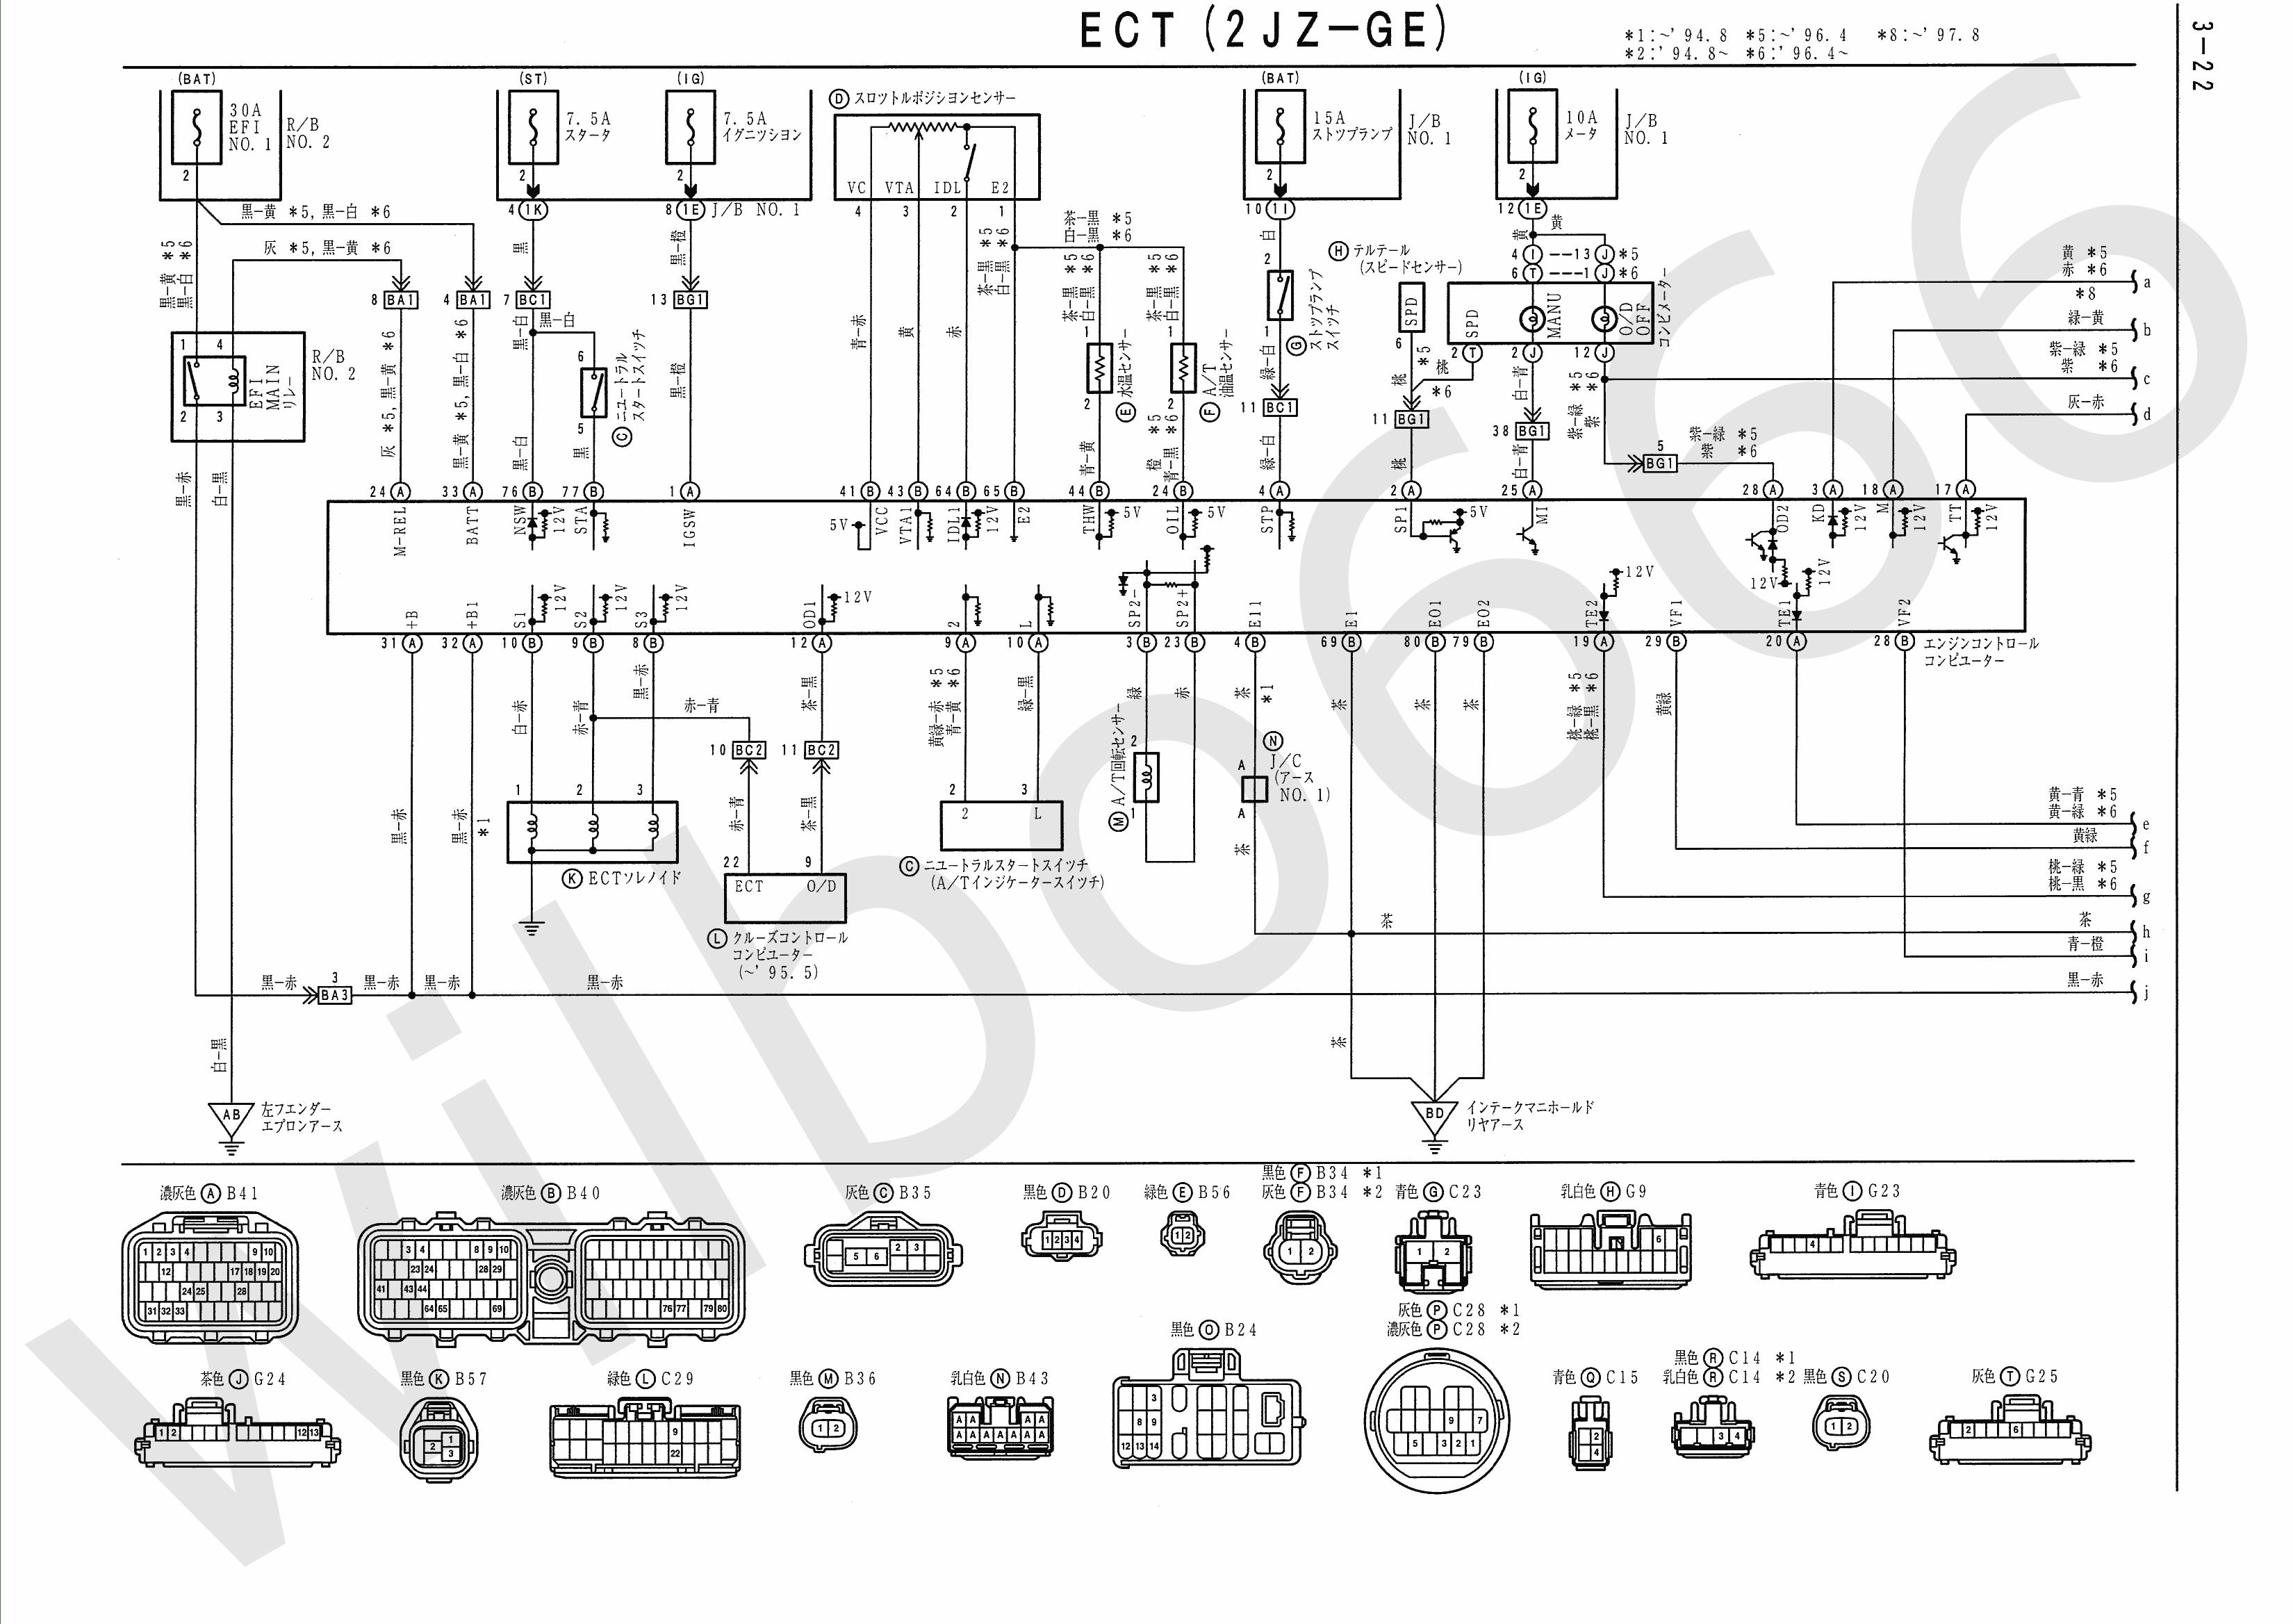 2jz ge ecu wiring diagram 2007 toyota fj cruiser headlight wilbo666 / 2jz-ge jza80 supra engine